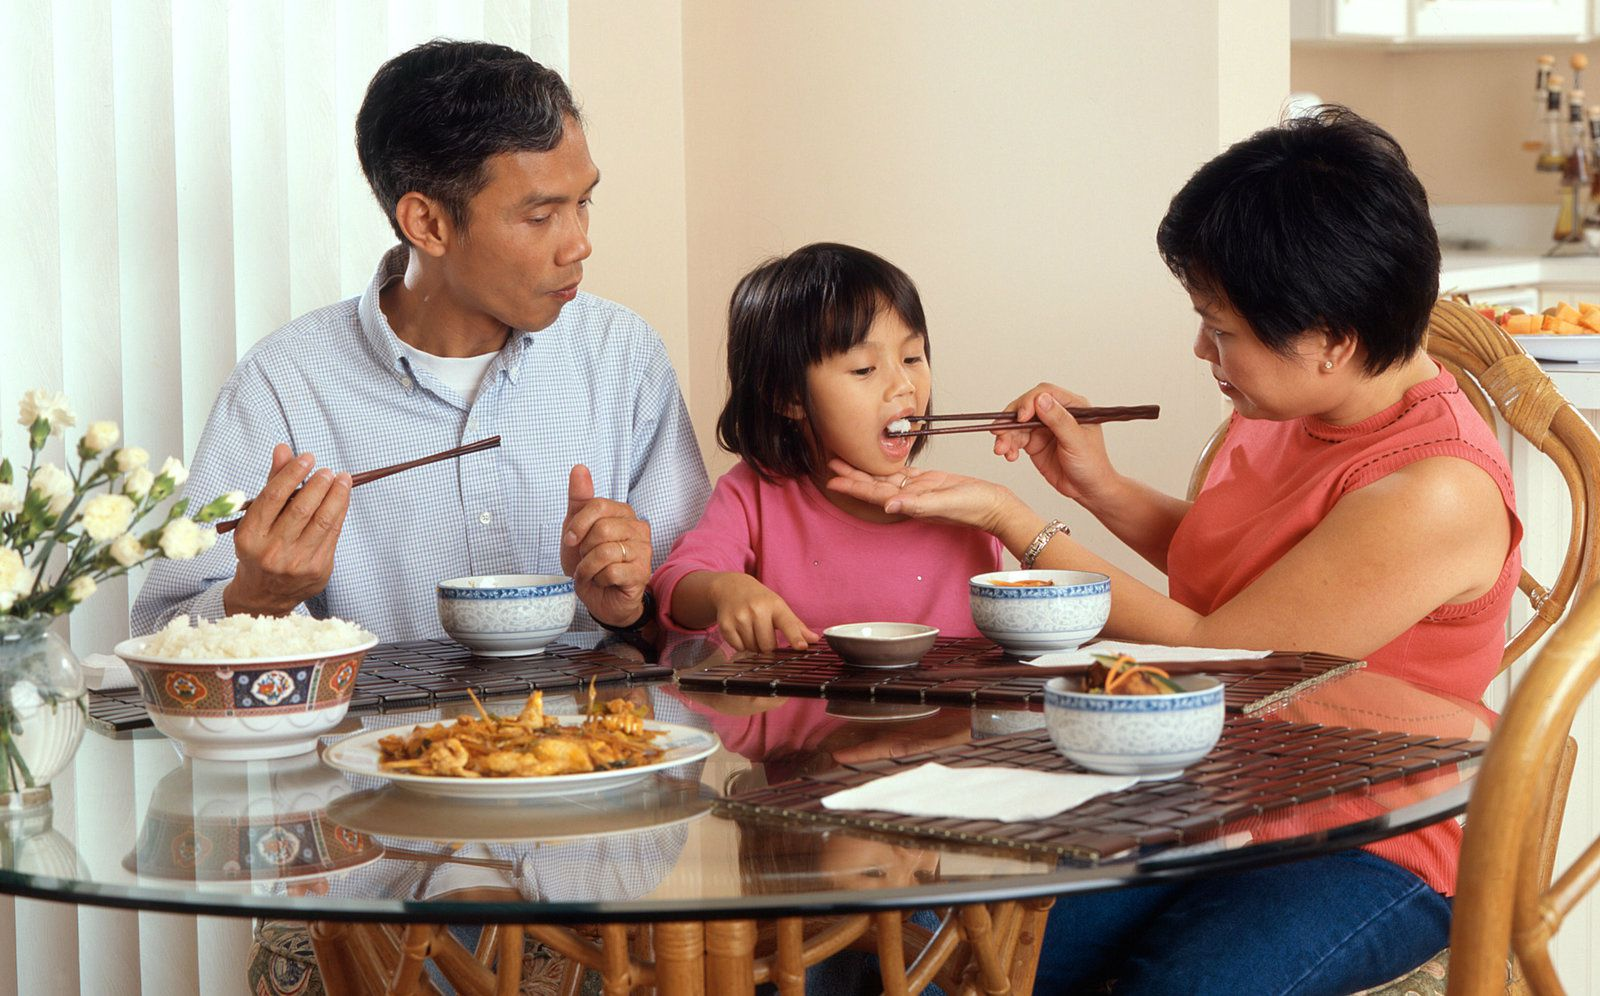 Repas en Chine : nourriture salie, nourriture bannie !